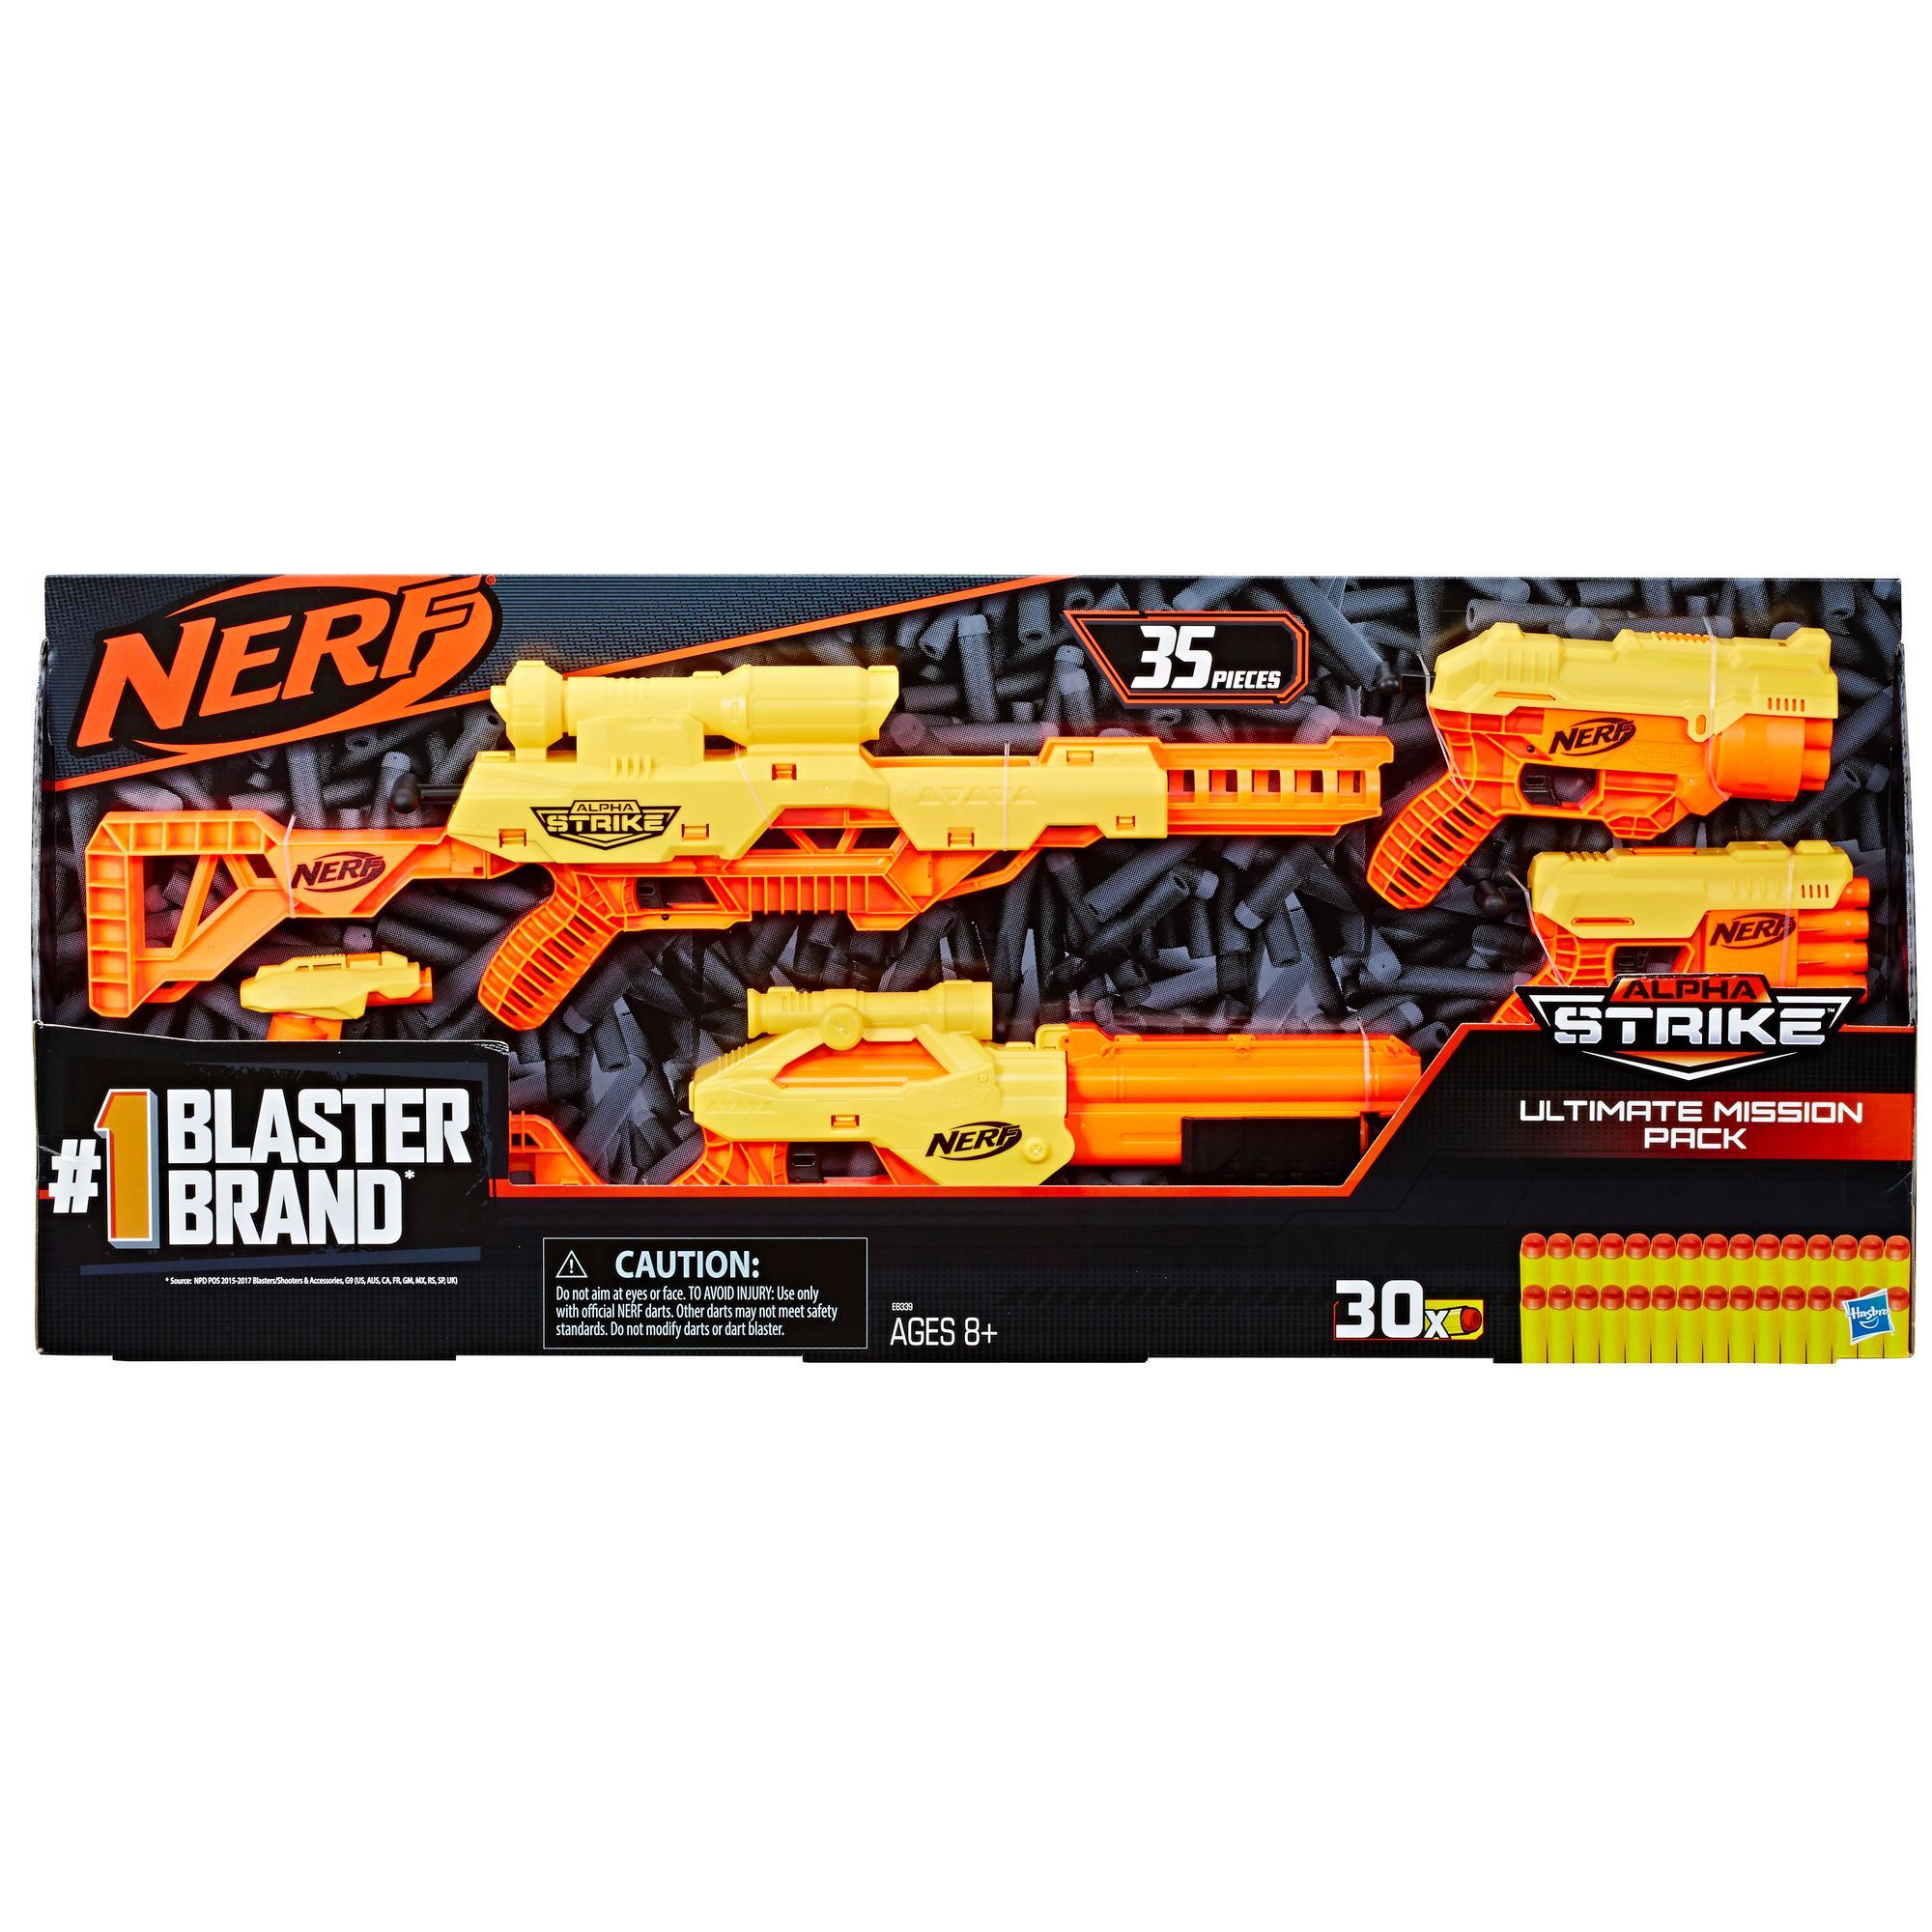 Gran pack de misión Nerf Alpha Strike